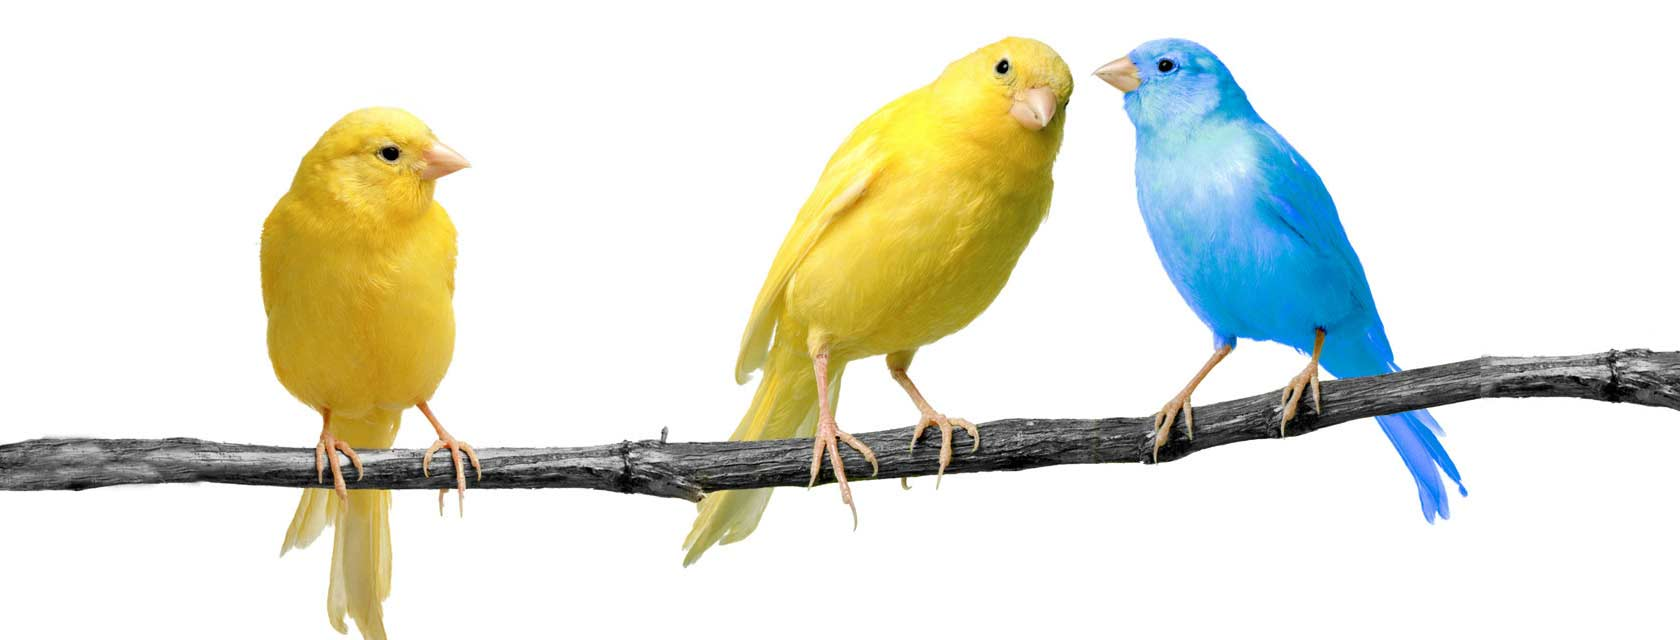 Public Relations Orange County - Birds Tweeting